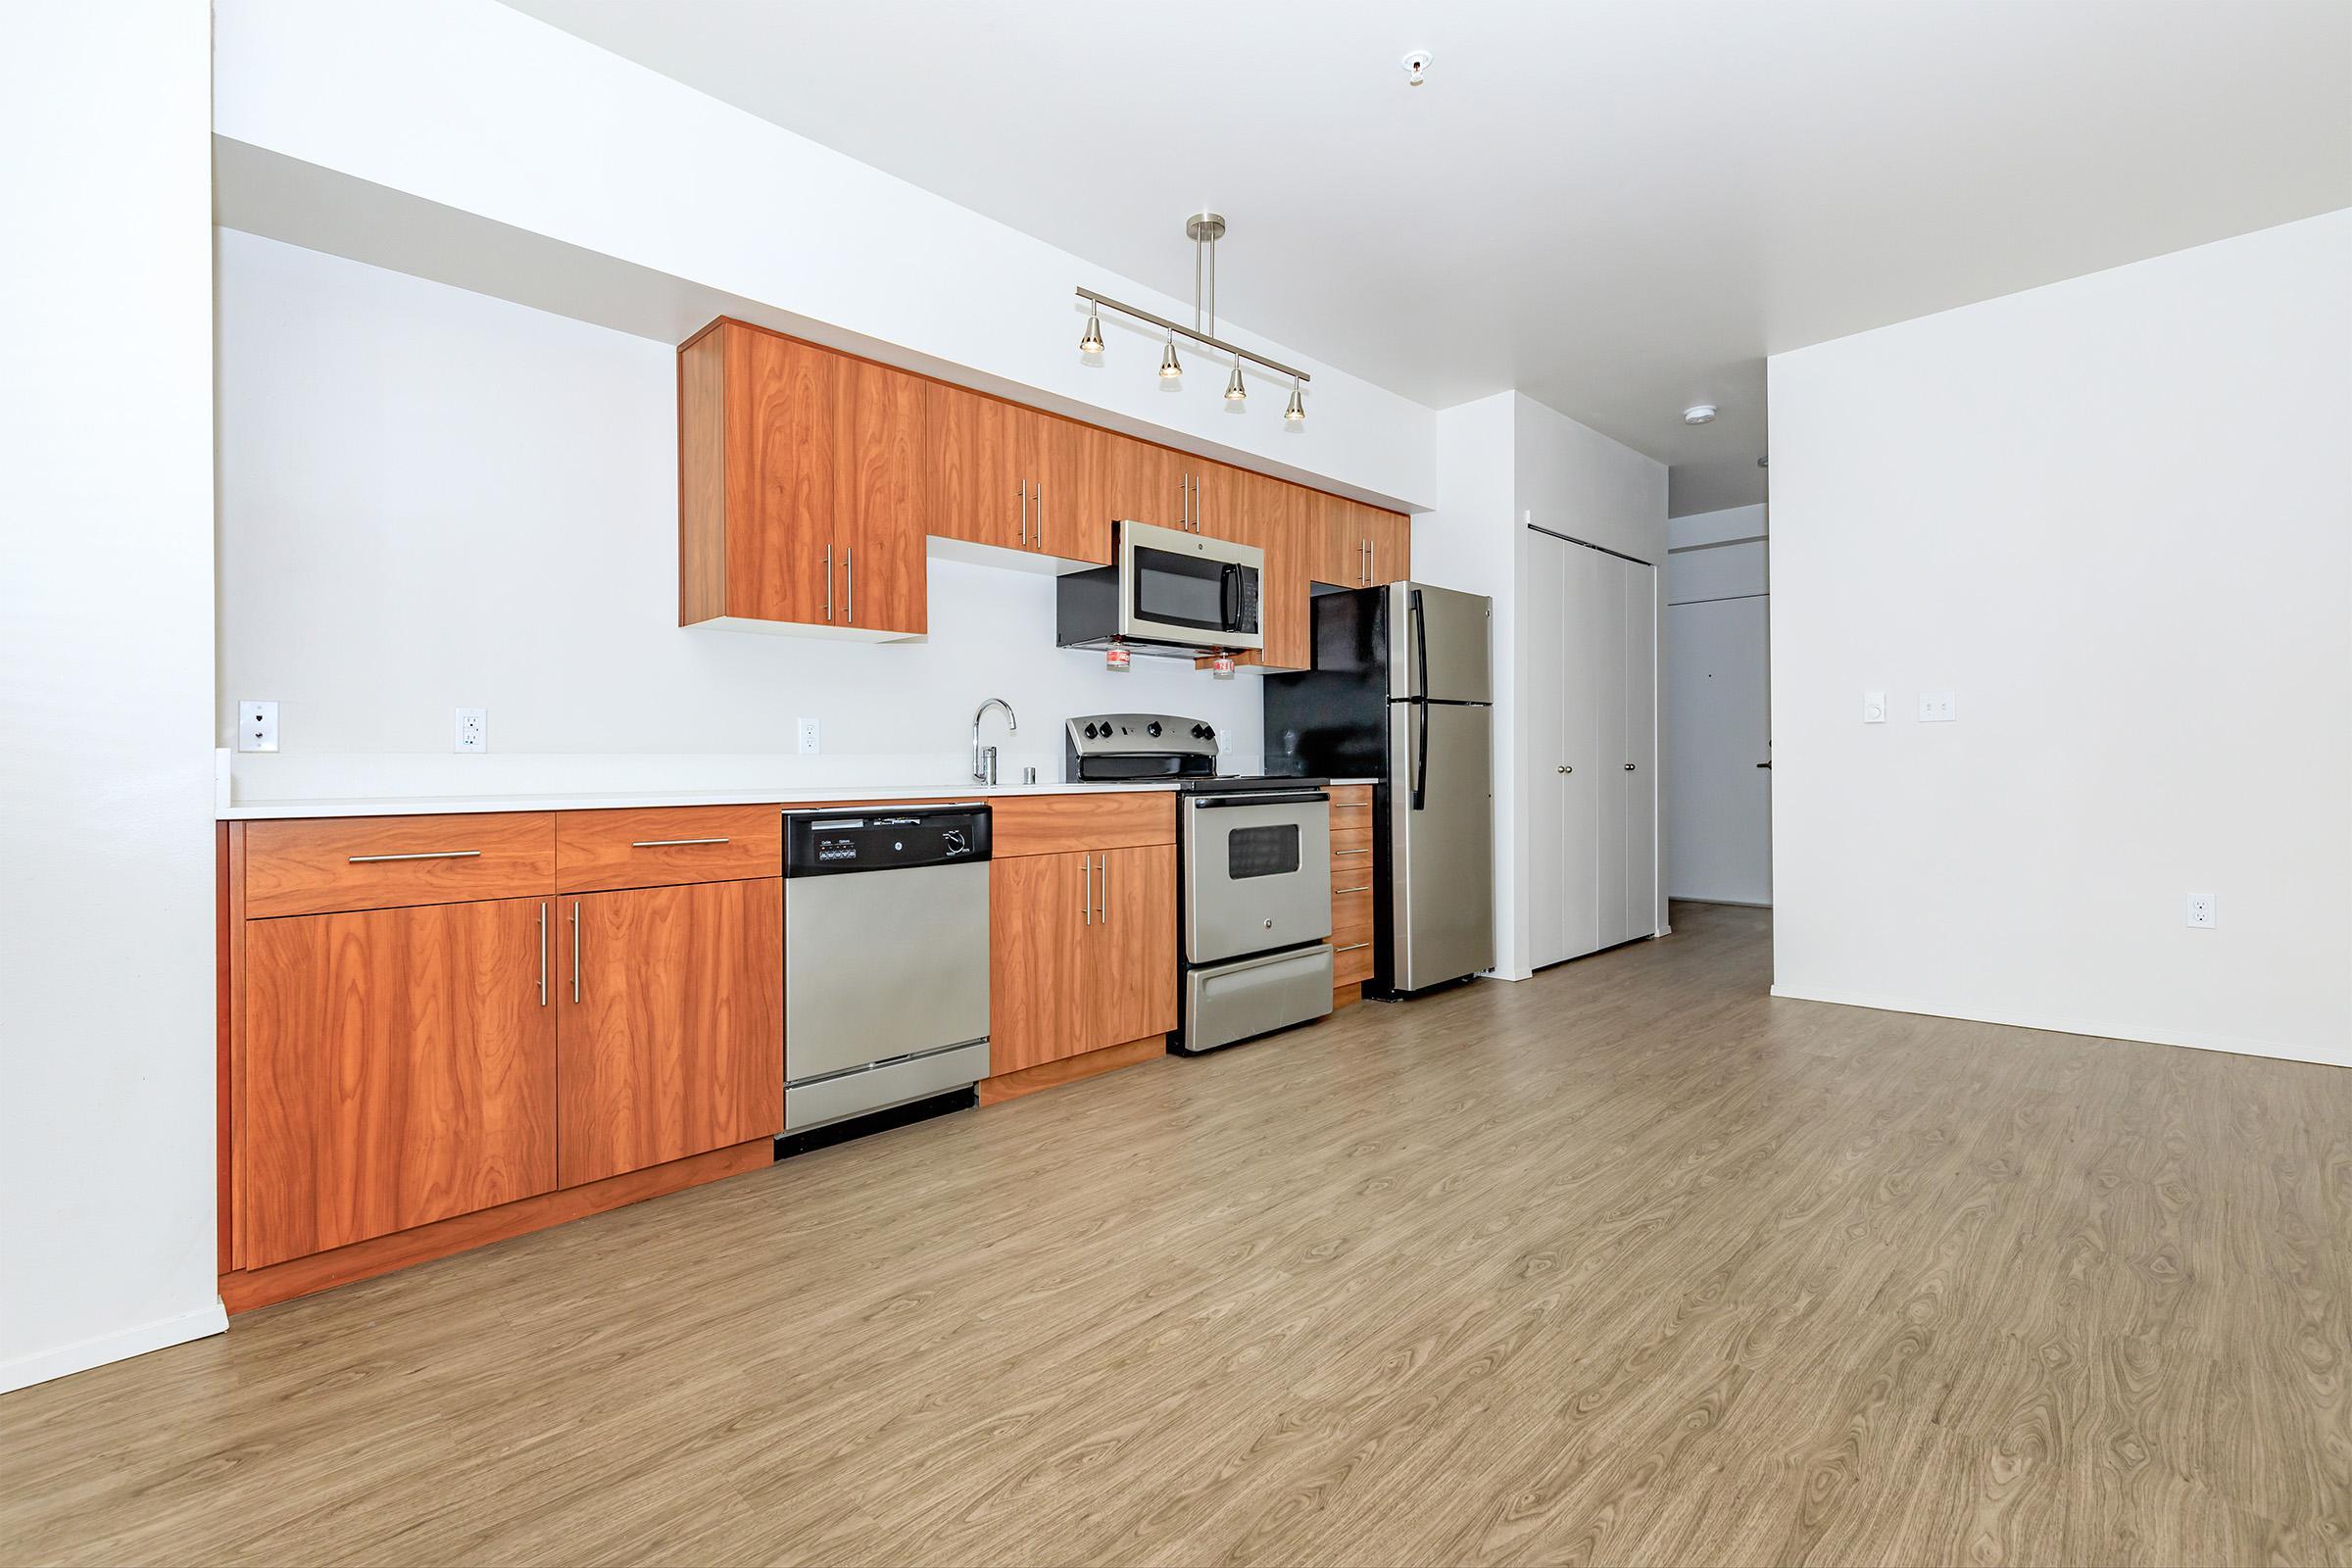 a refrigerator in a kitchen